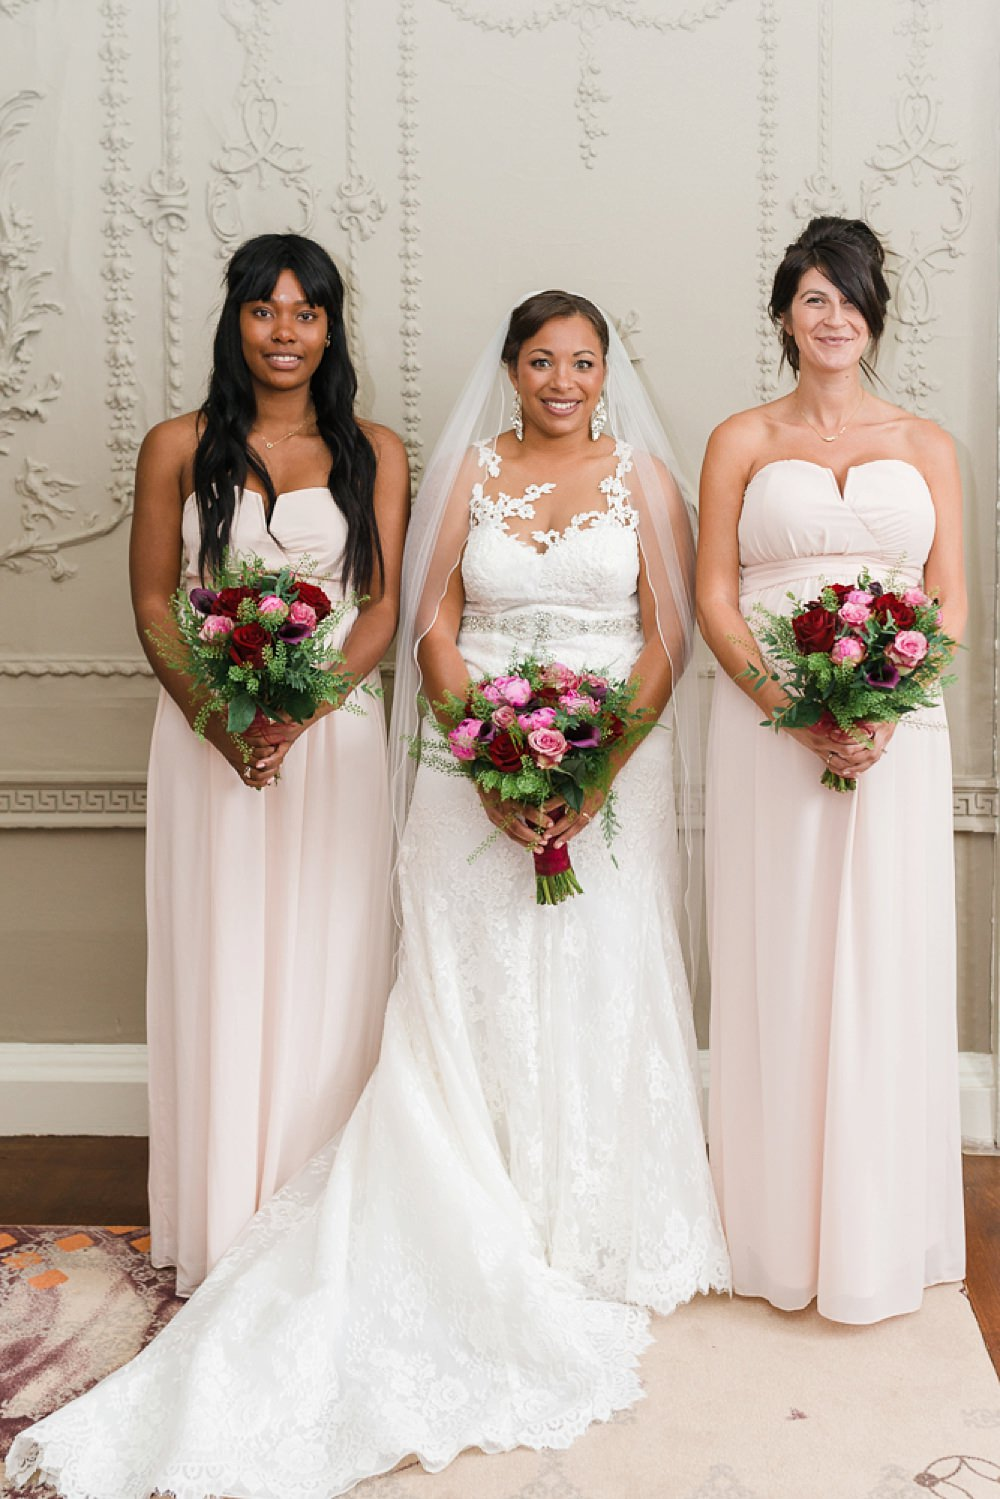 Bride Bridal La Sposa Fit & Flare Lace Dress Gown Floor Length Veil Pink Red Bouquet Pink Strapless Bridesmaids Stoke Place Wedding Hannah McClune Photography